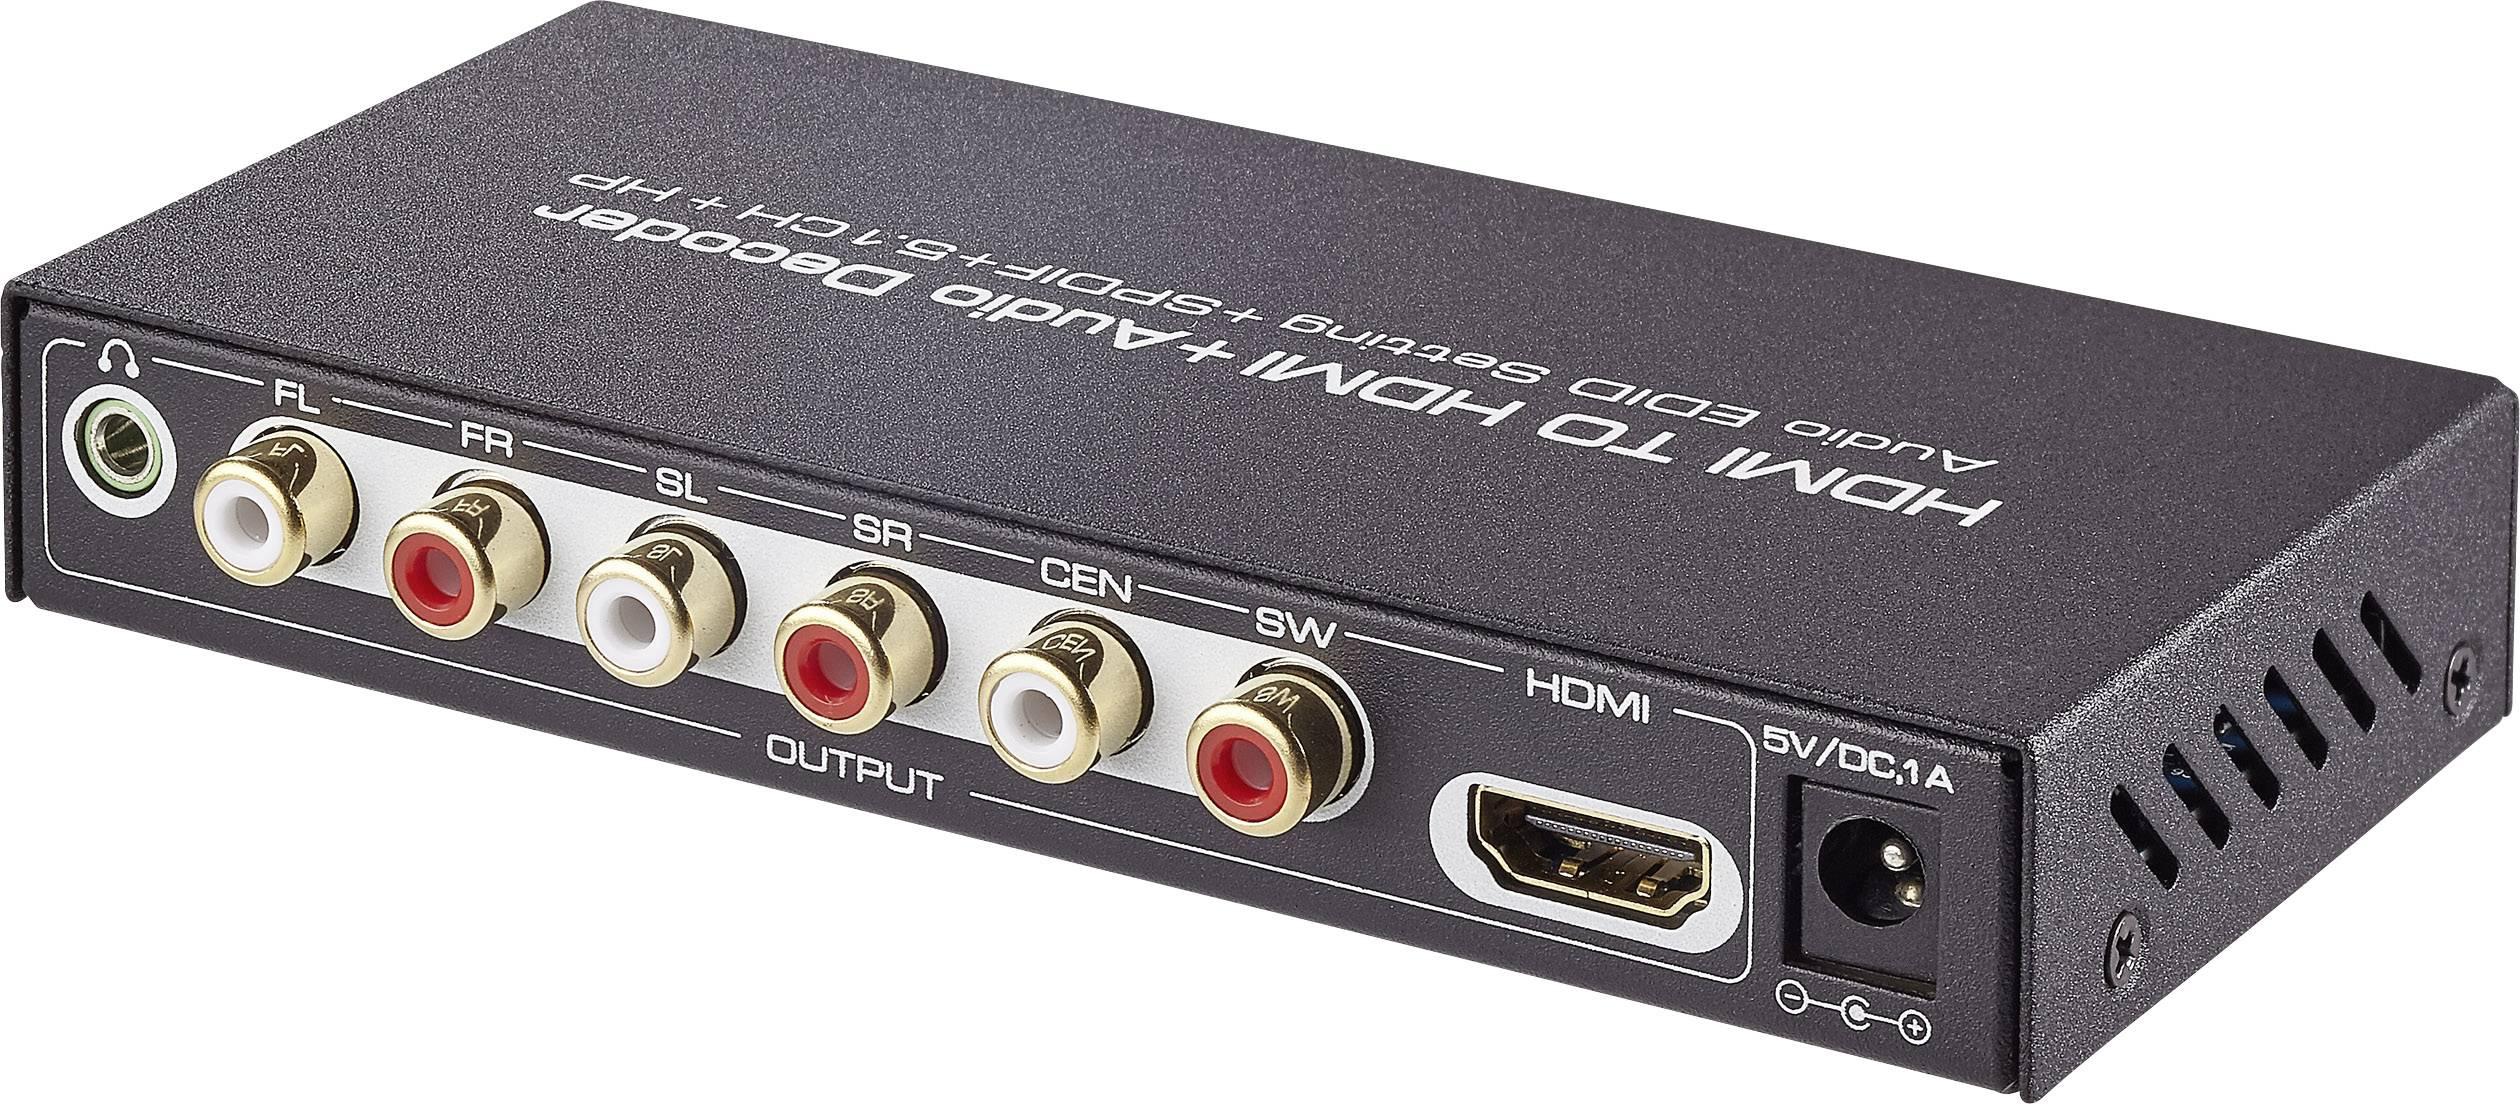 Audio Extraktor[HDMI - HDMI, Toslink, 6-kanals RCA] 1920 x